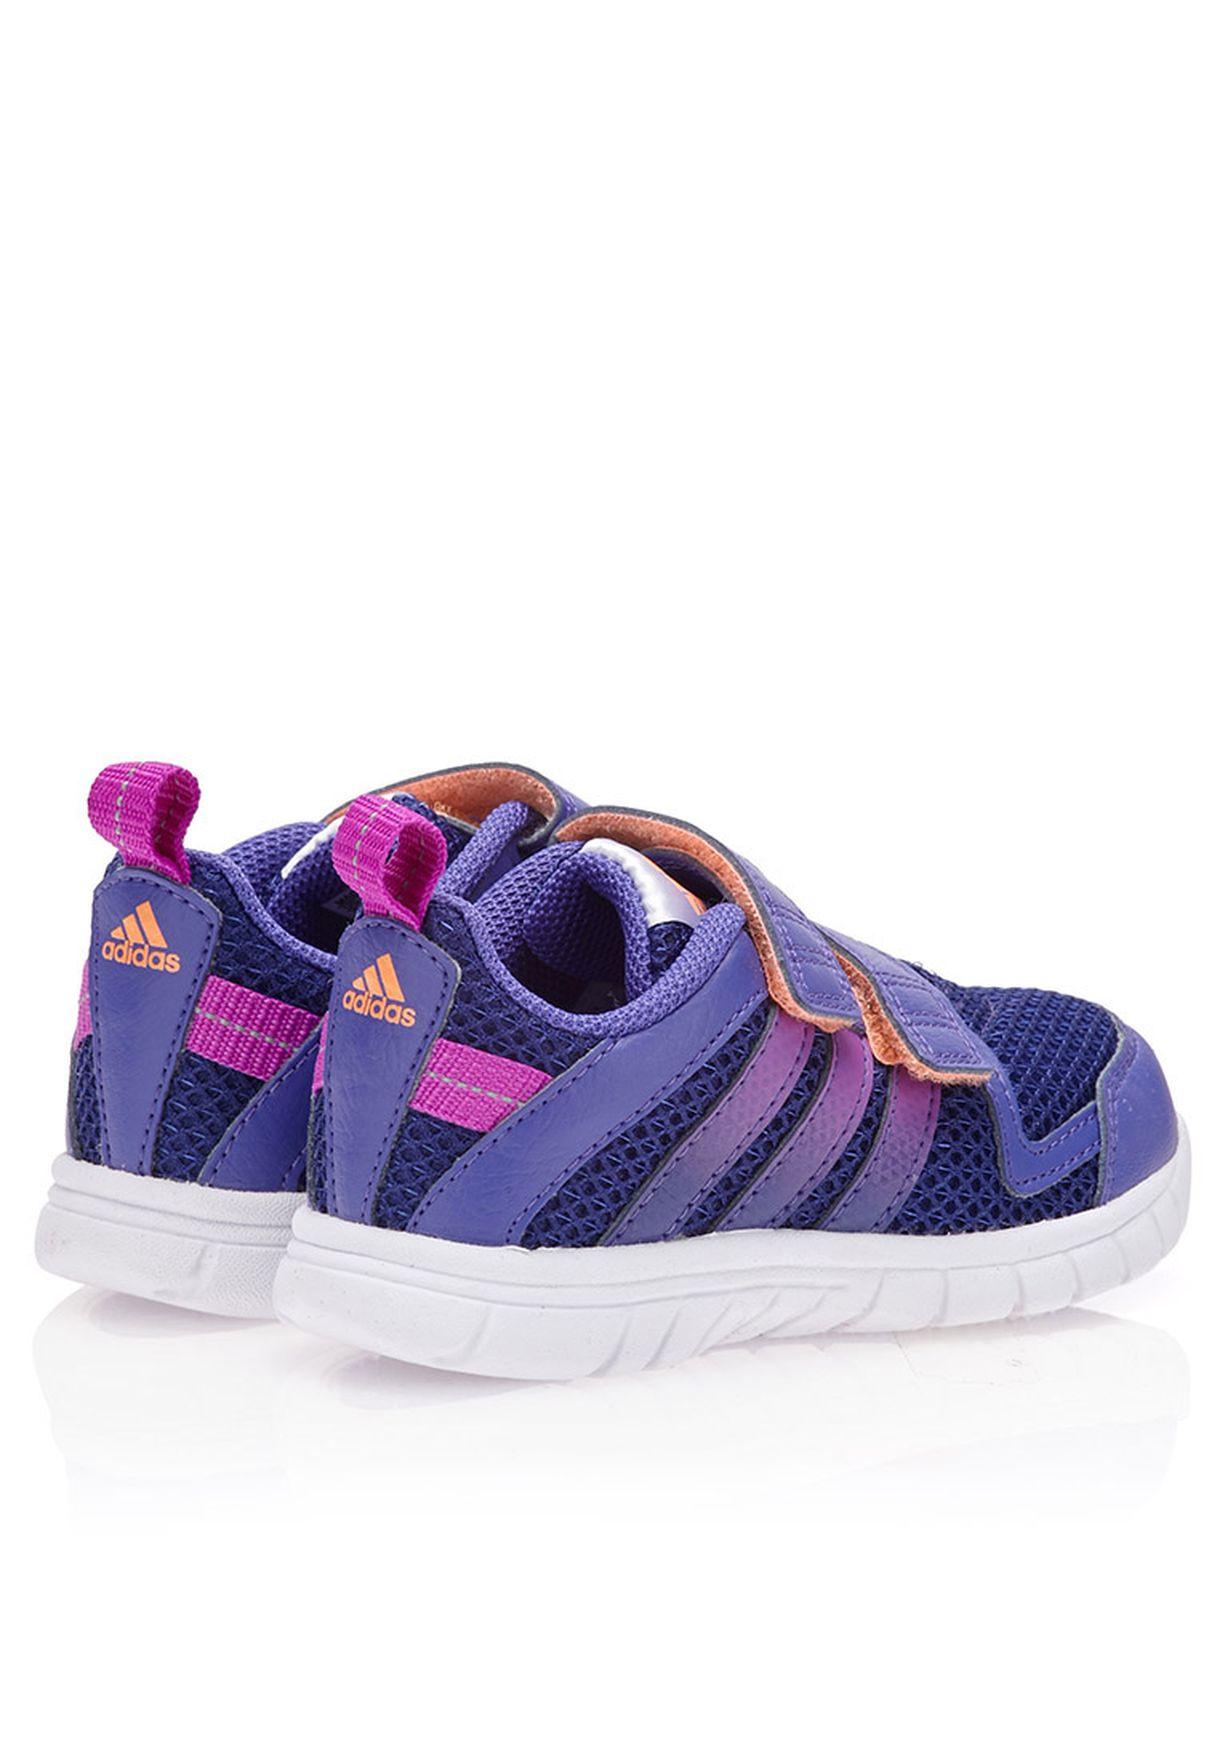 adidas neo label Sneaker Cloudfoam CF SATURN M schwarz